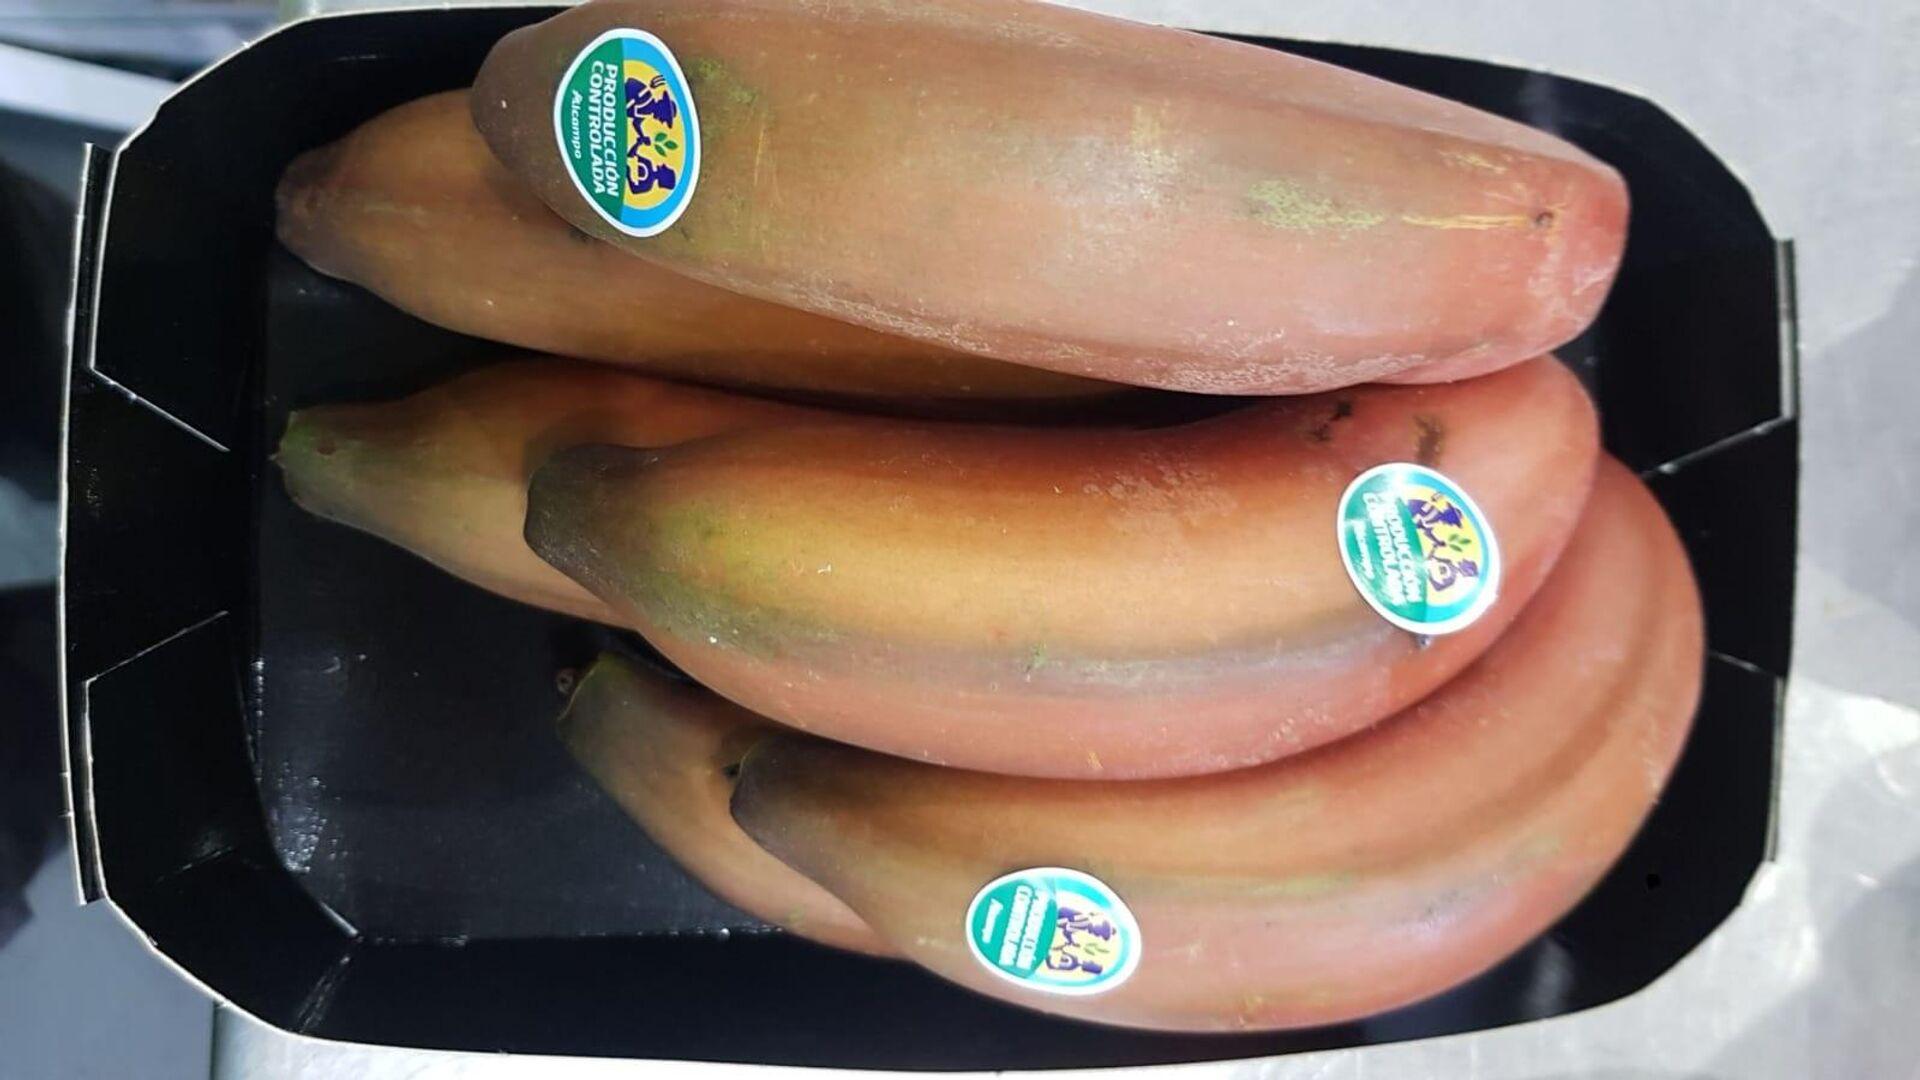 Bandeja de plátanos rojos canarios de Alcampo - Sputnik Mundo, 1920, 14.04.2021